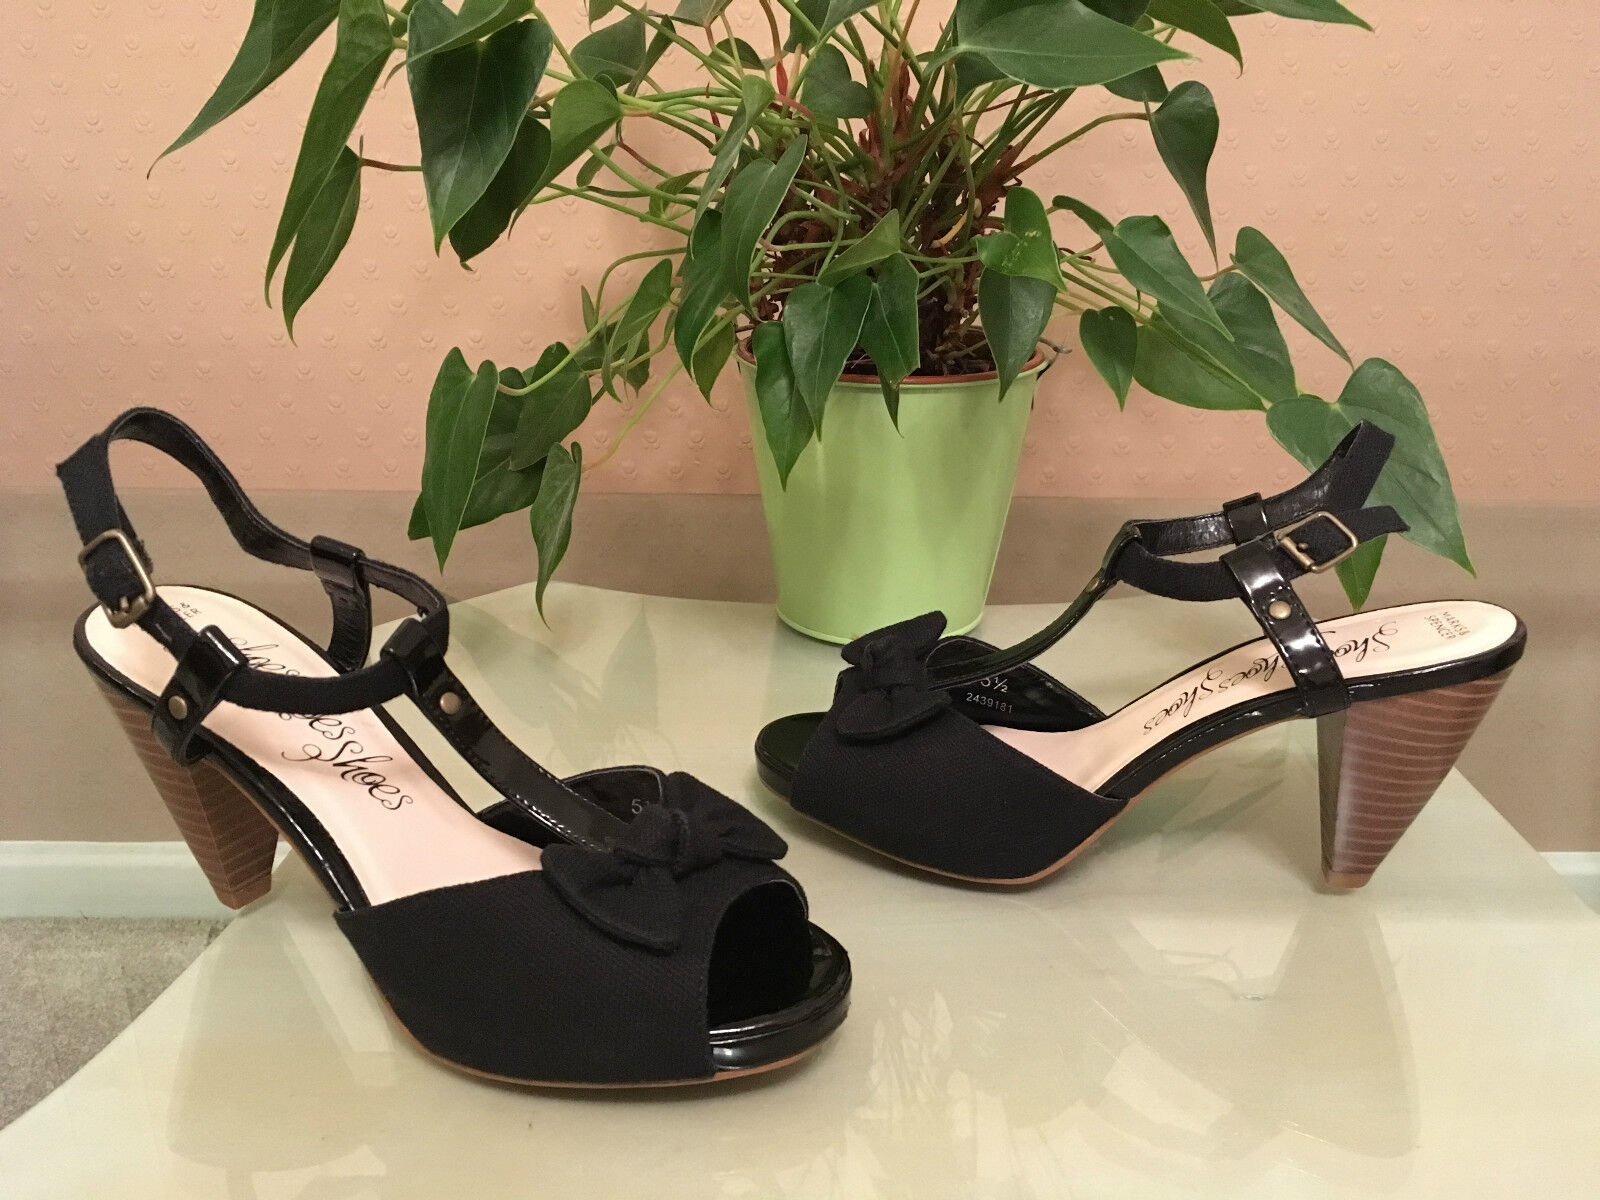 Ladies Marks & Spencer black canvas/patent t-bar ankle strap shoe UK 5.5 EU 38.5